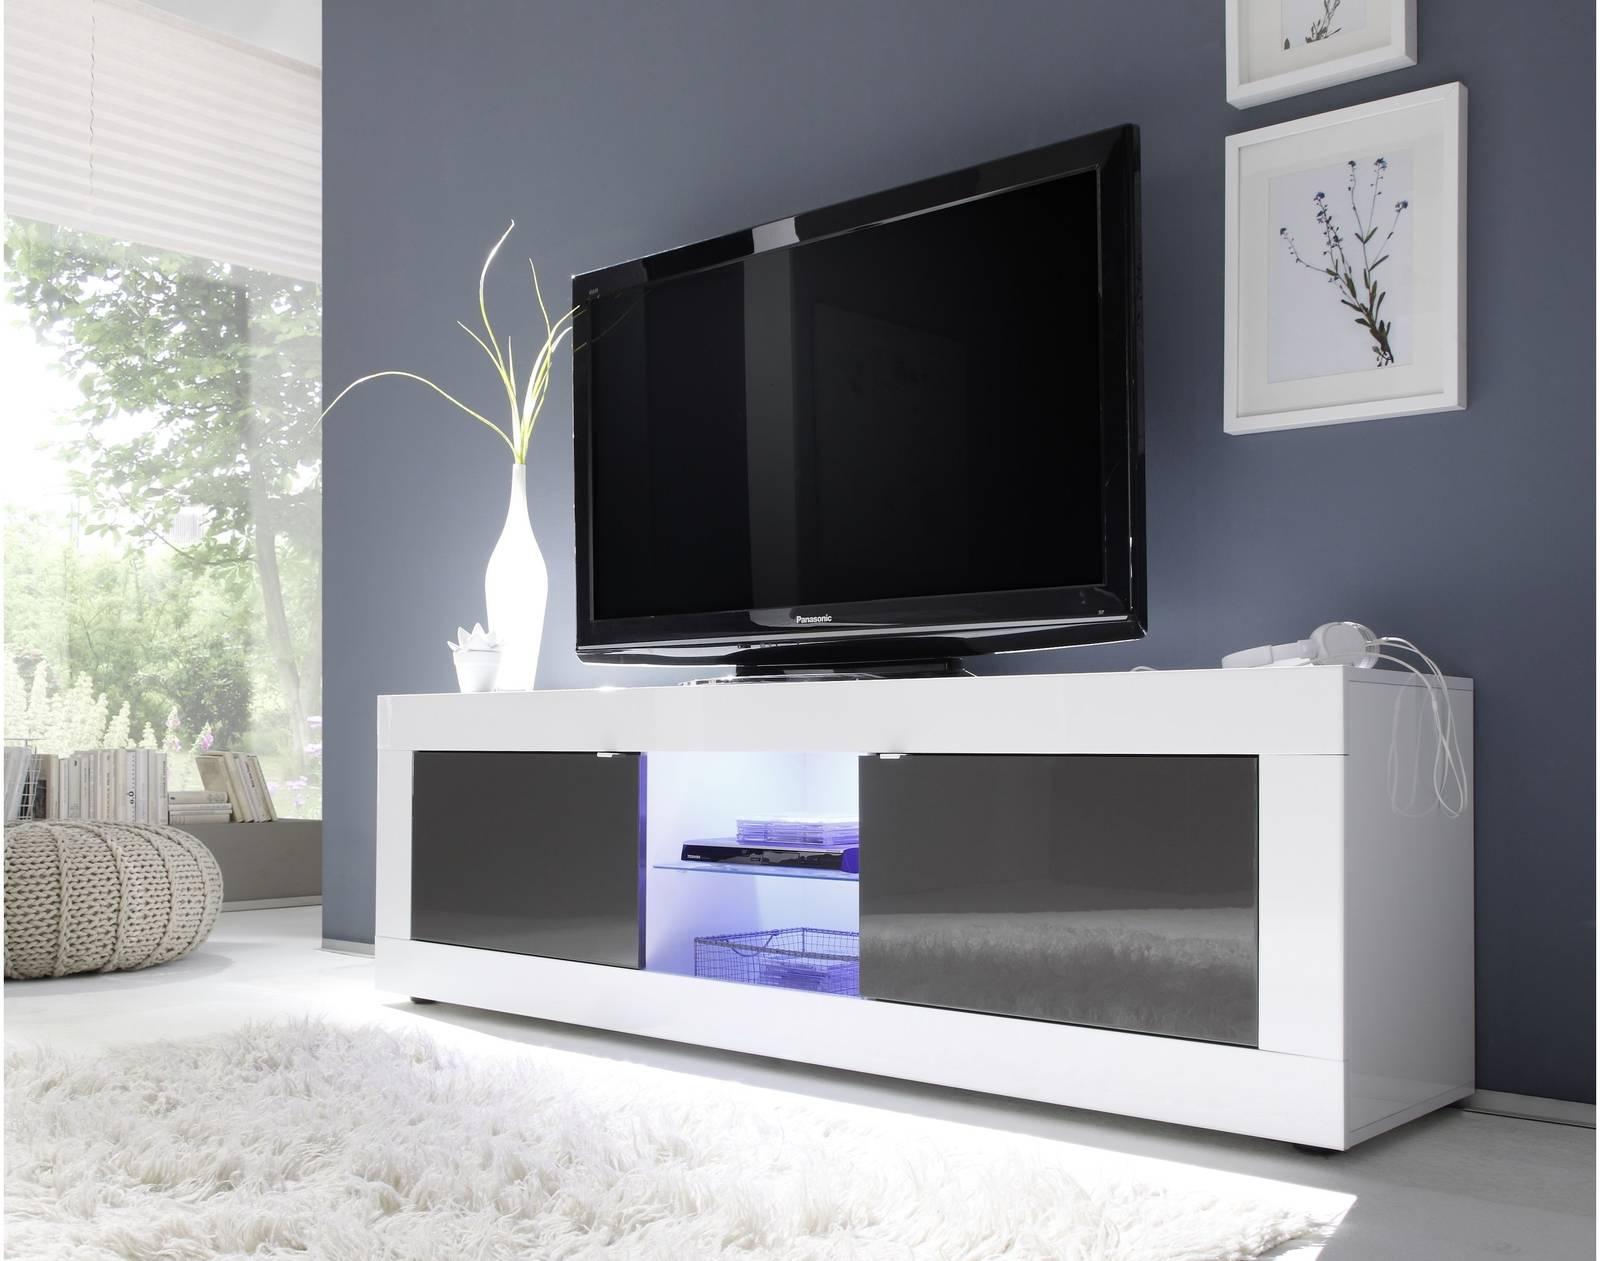 Tv Taso Moderni 181x56x43 Cm Valkoinen Antrasiitti